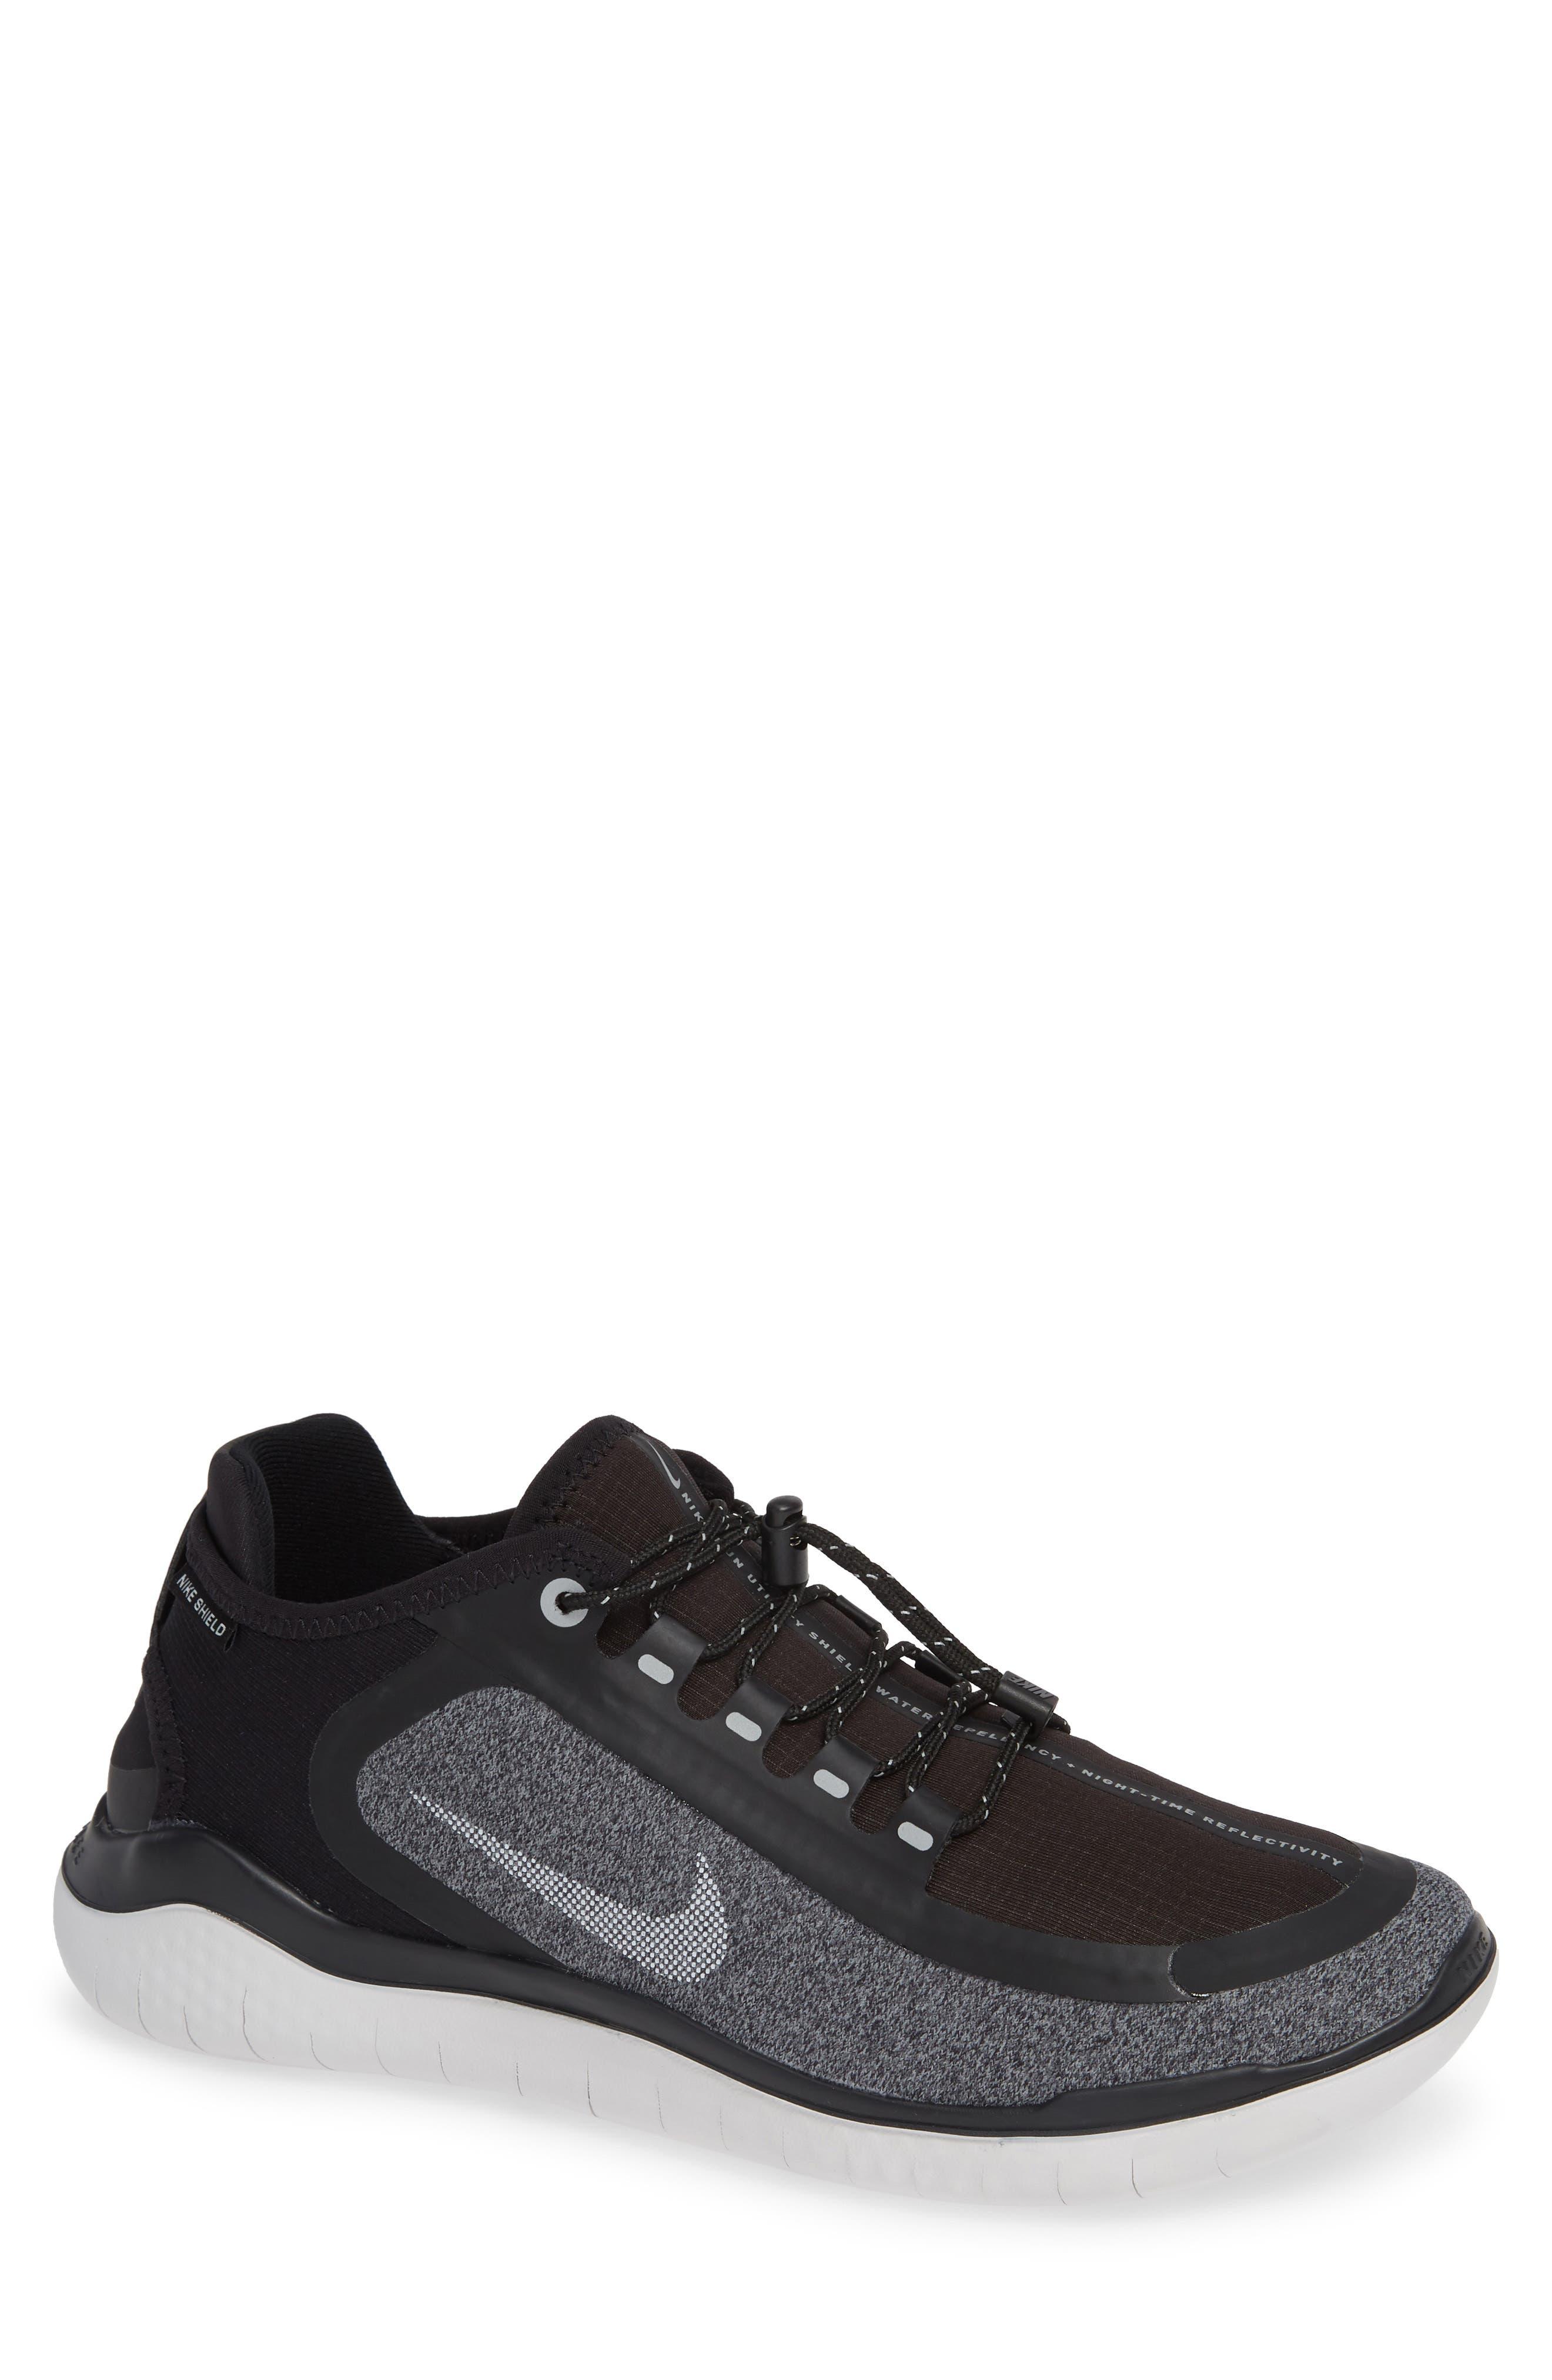 4e31dc79bc64c Nike Workout Shoes